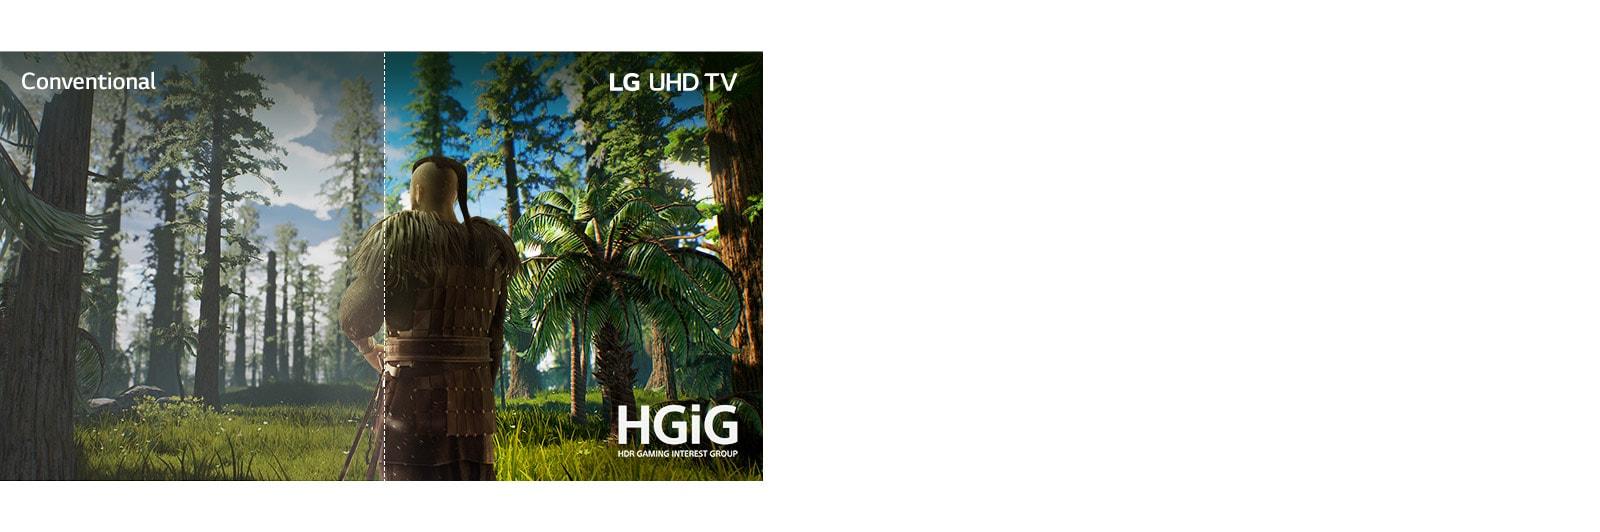 LG 55UN7190PTA HGiG profile